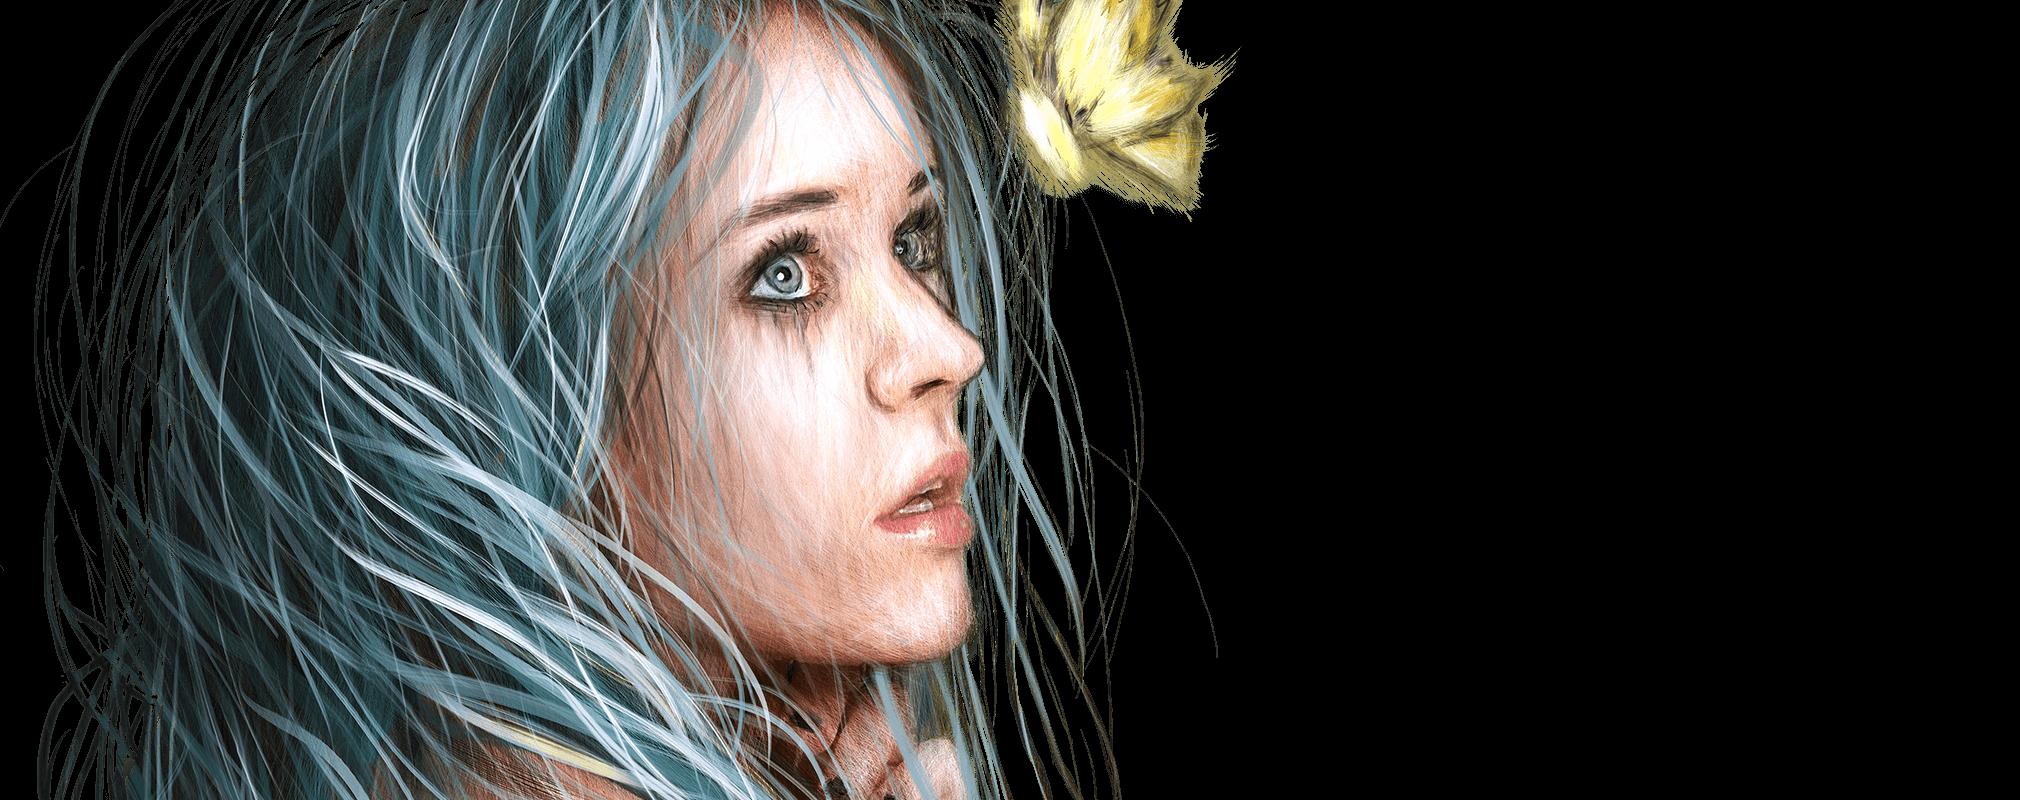 Digital Art Painting Software Corel Painter 2021